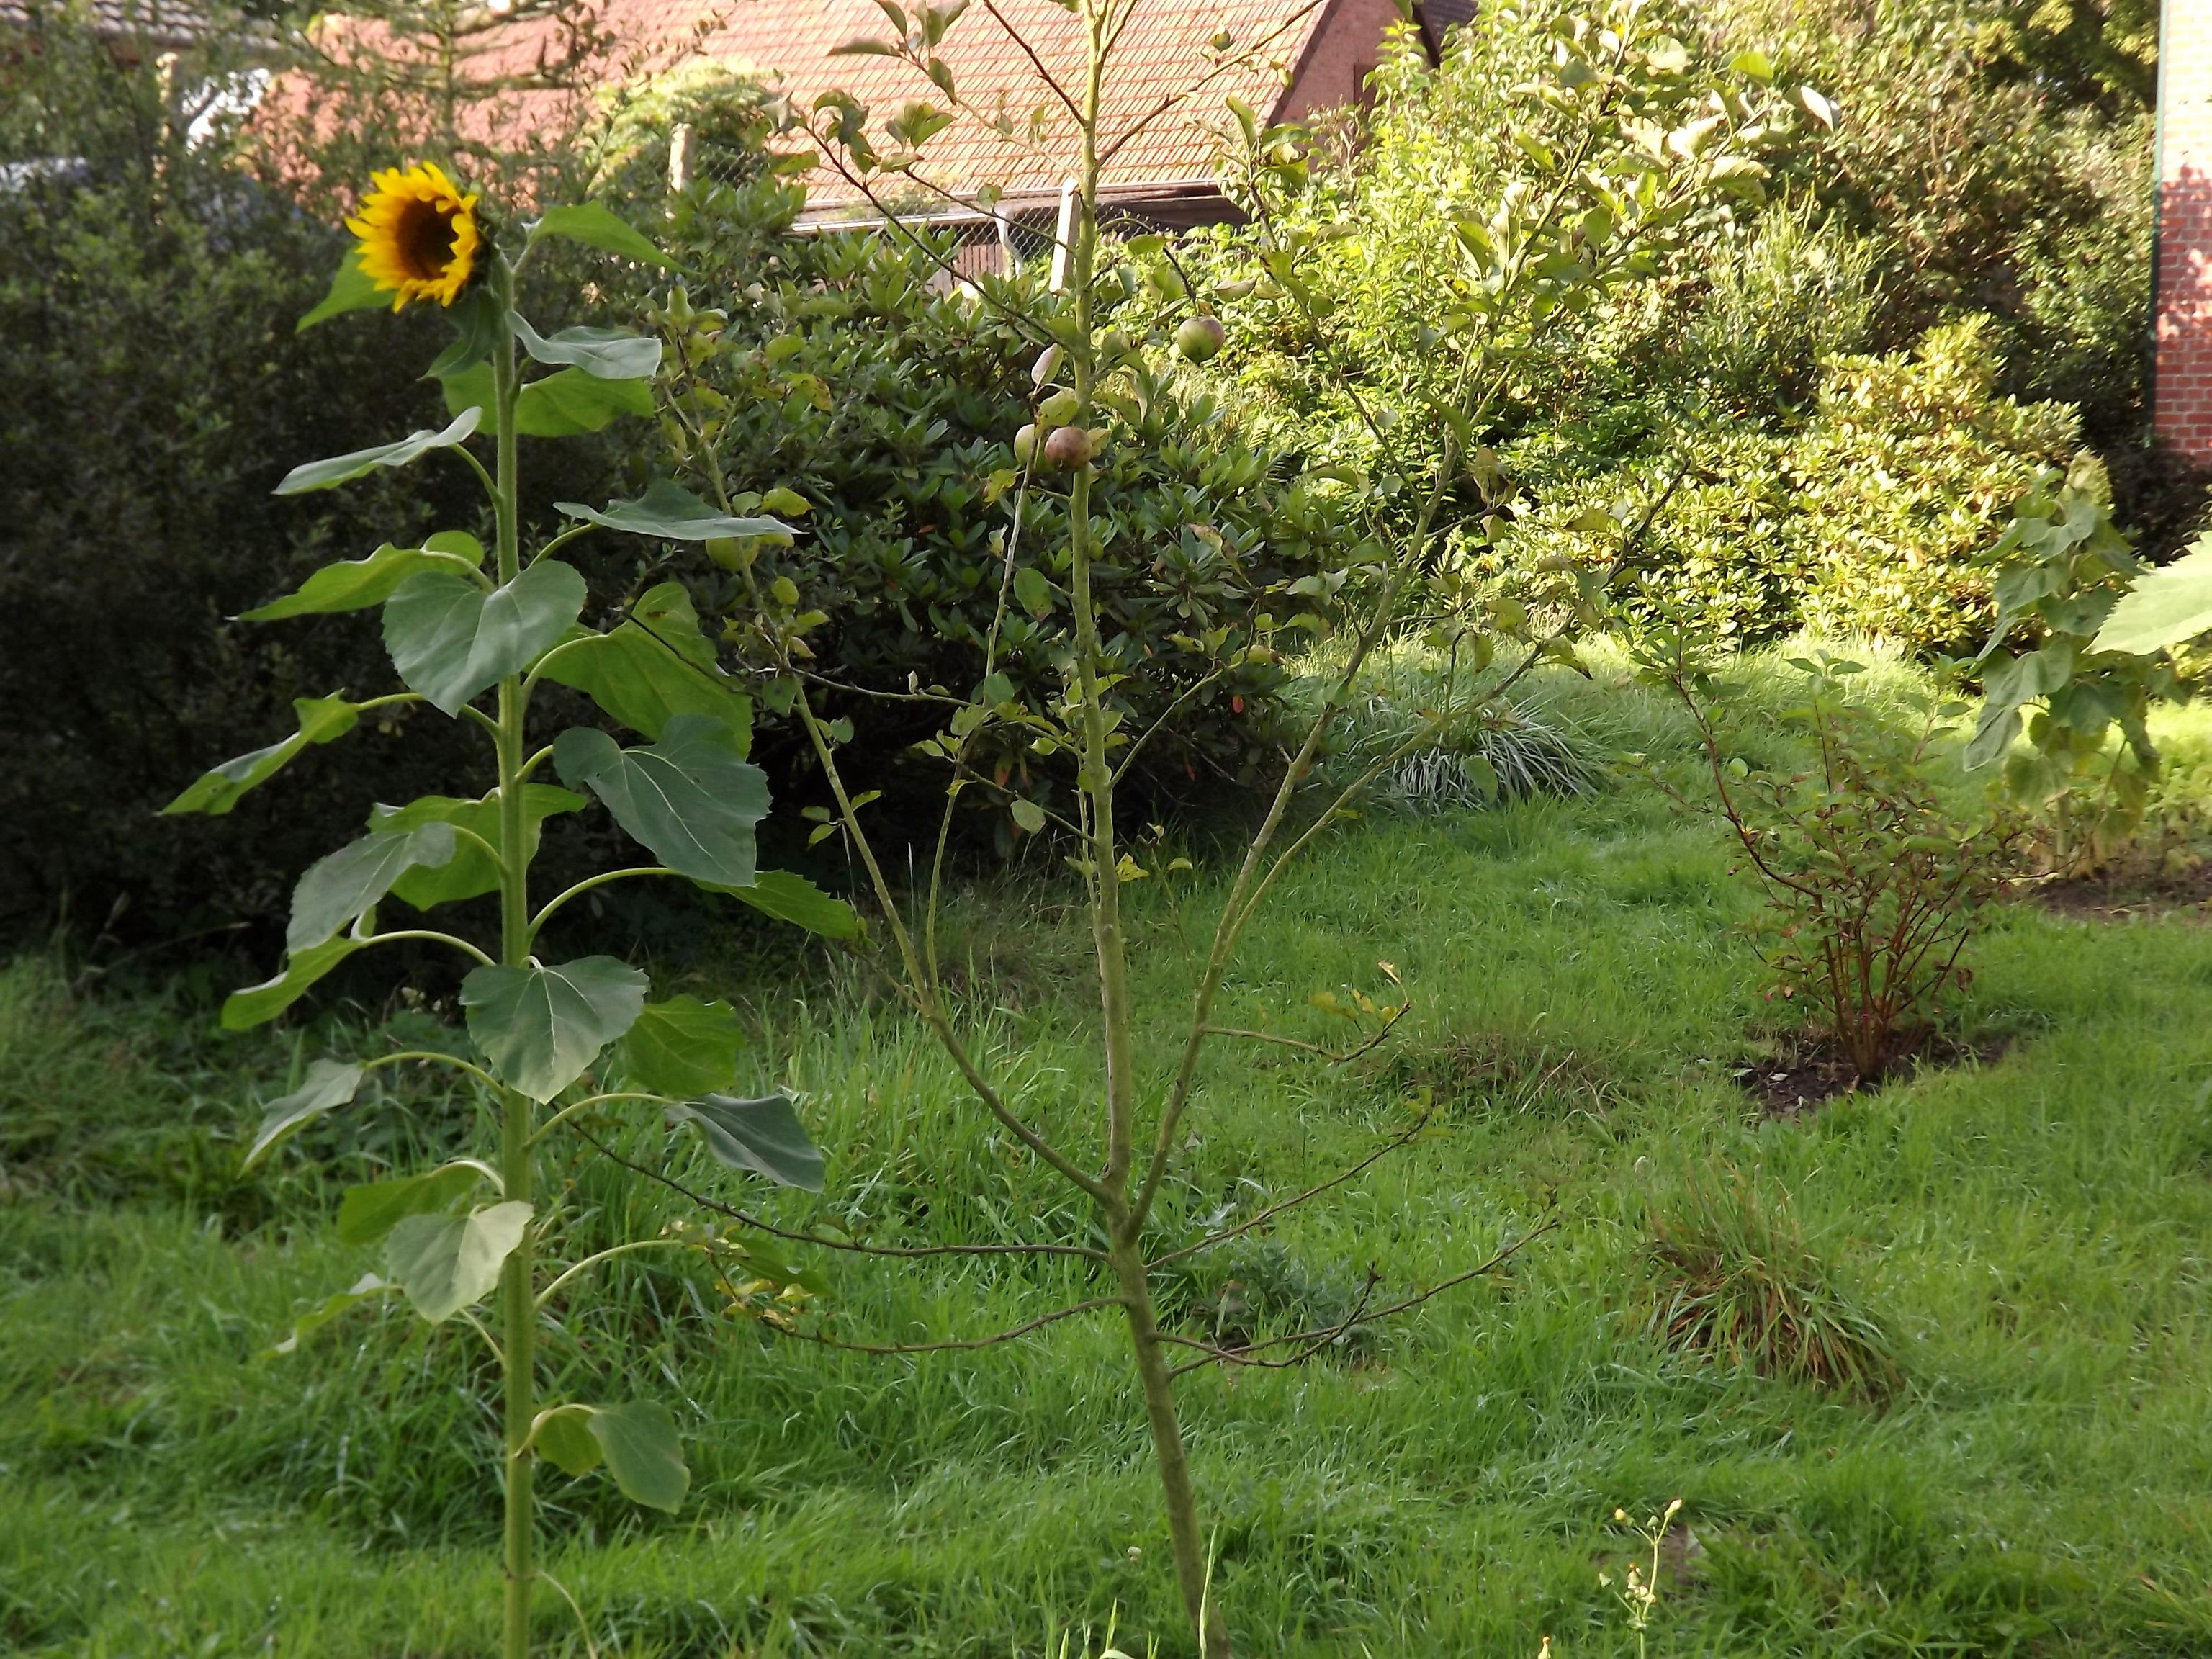 6436-wiese-apfelbaum-sonnenblume